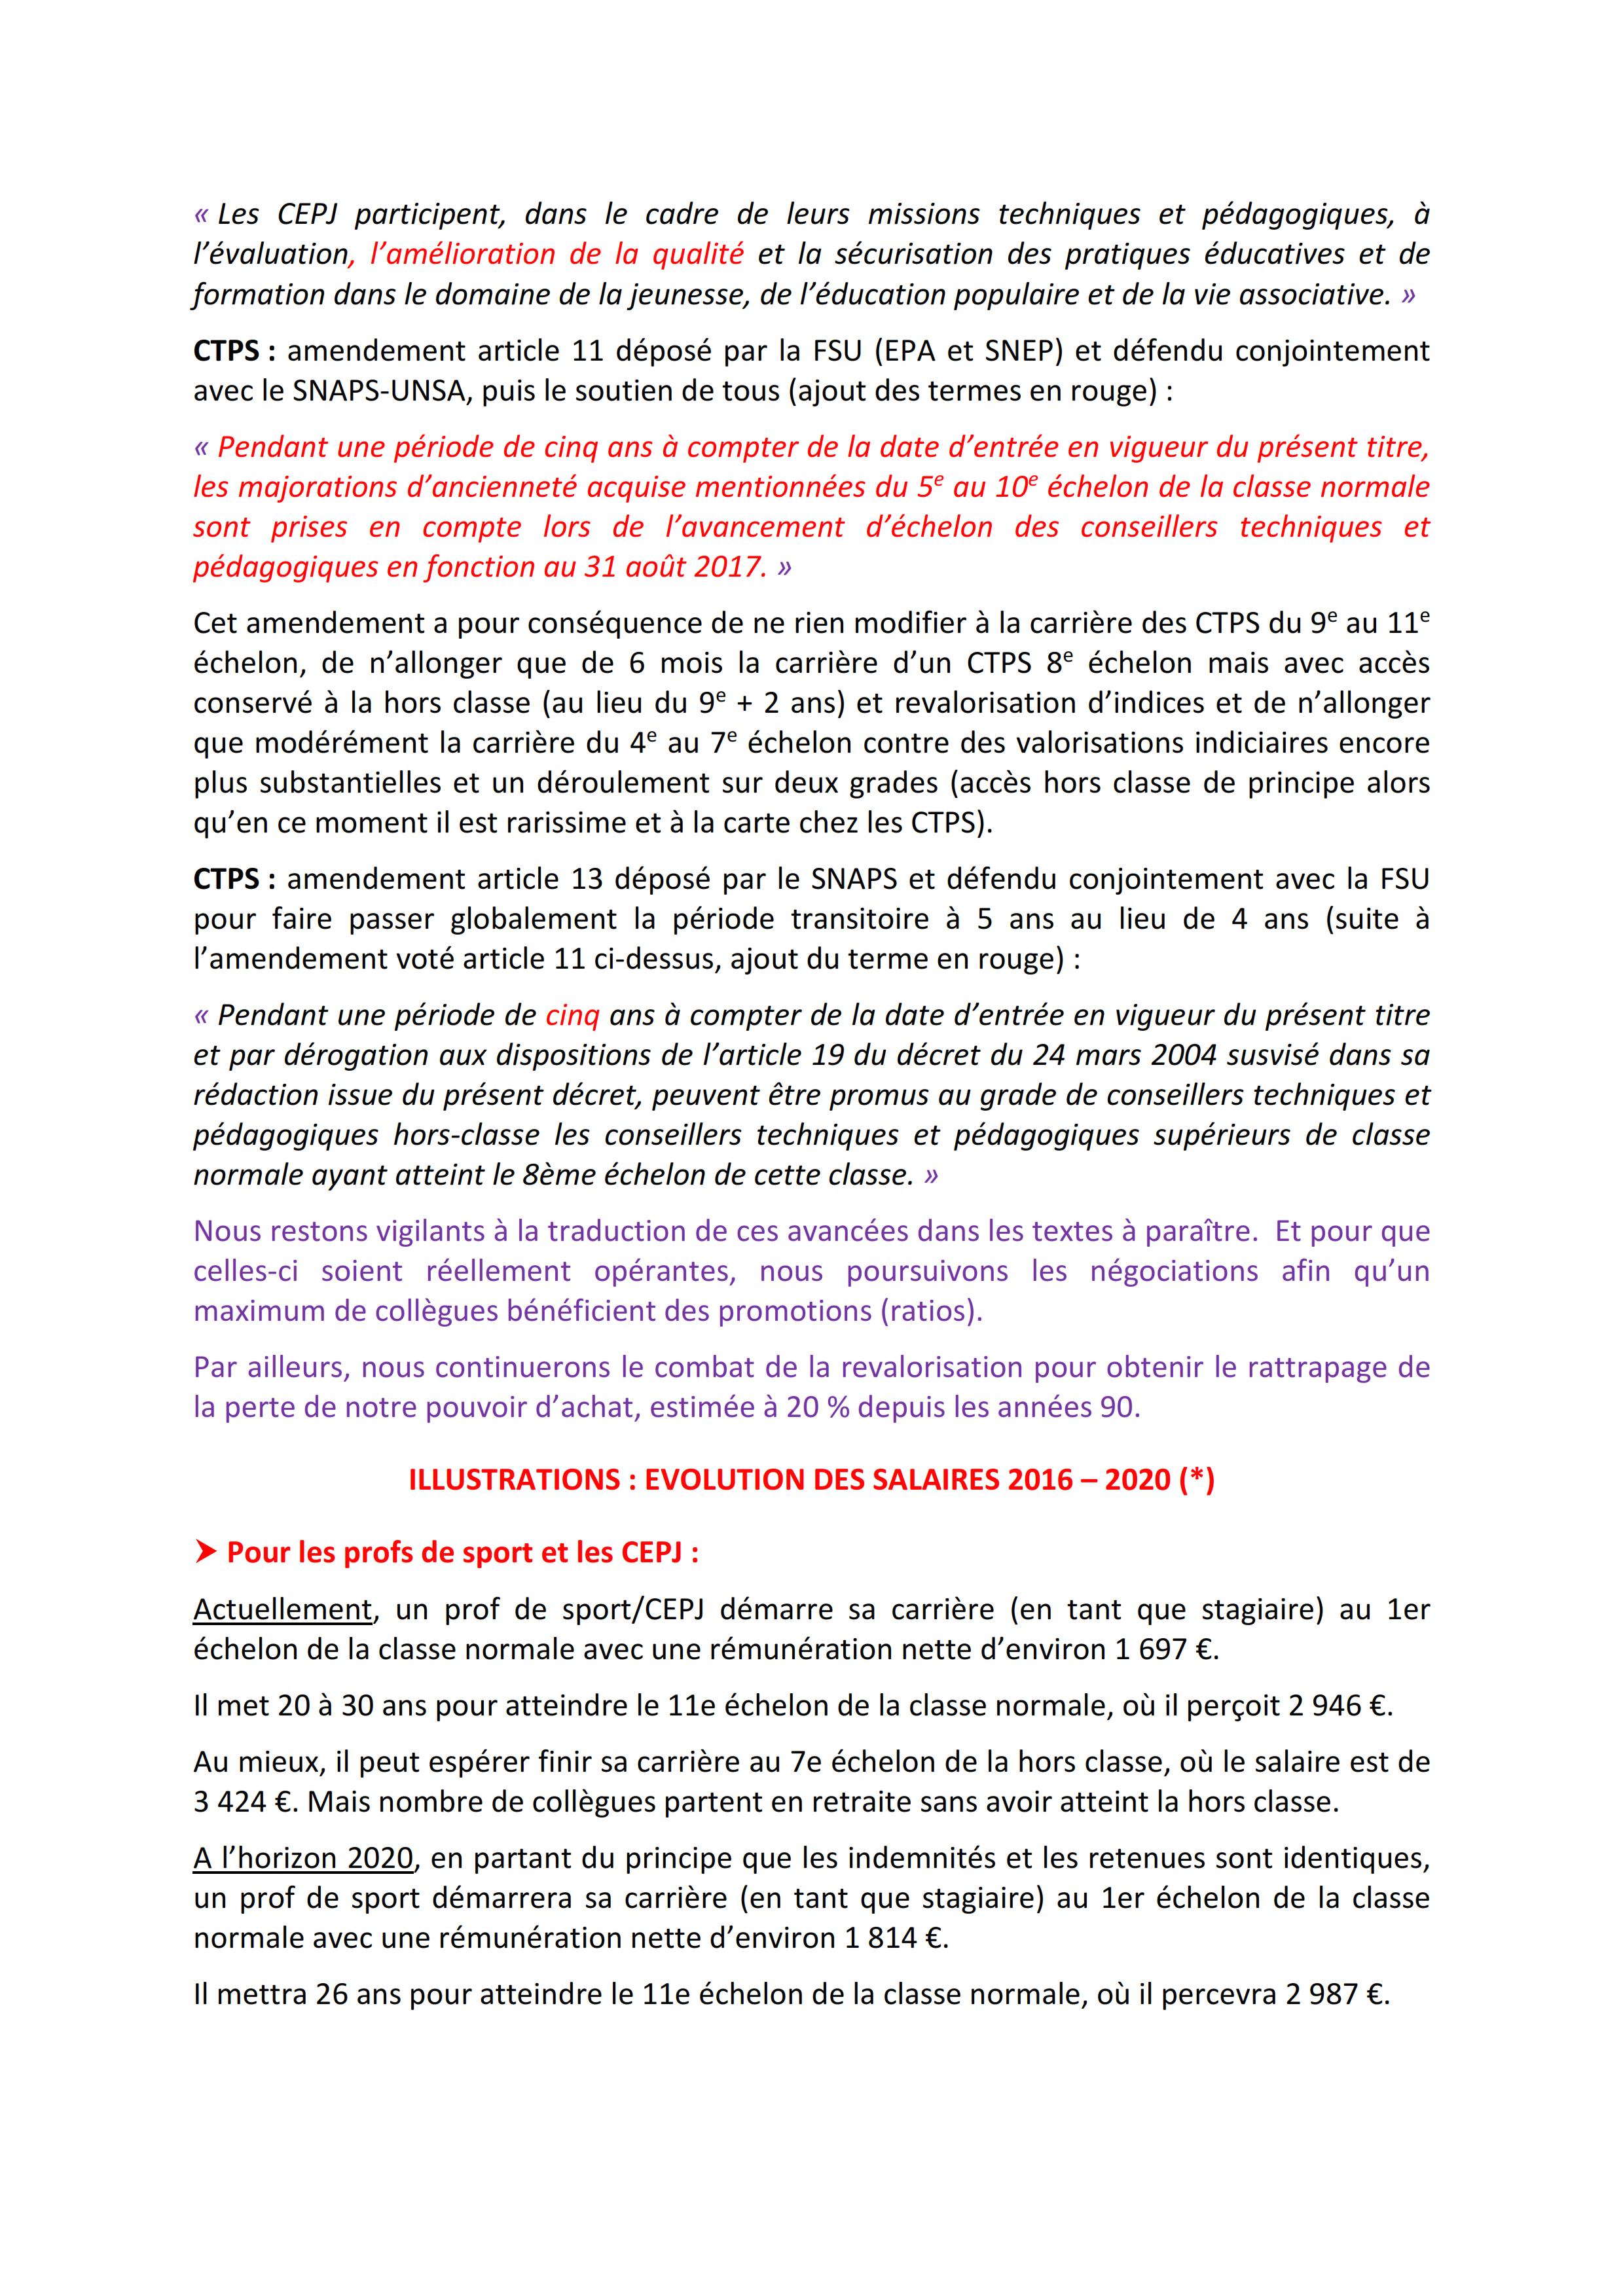 communication-fsu-epa-snep-ctm-8-novembre-2016-ppcr_004